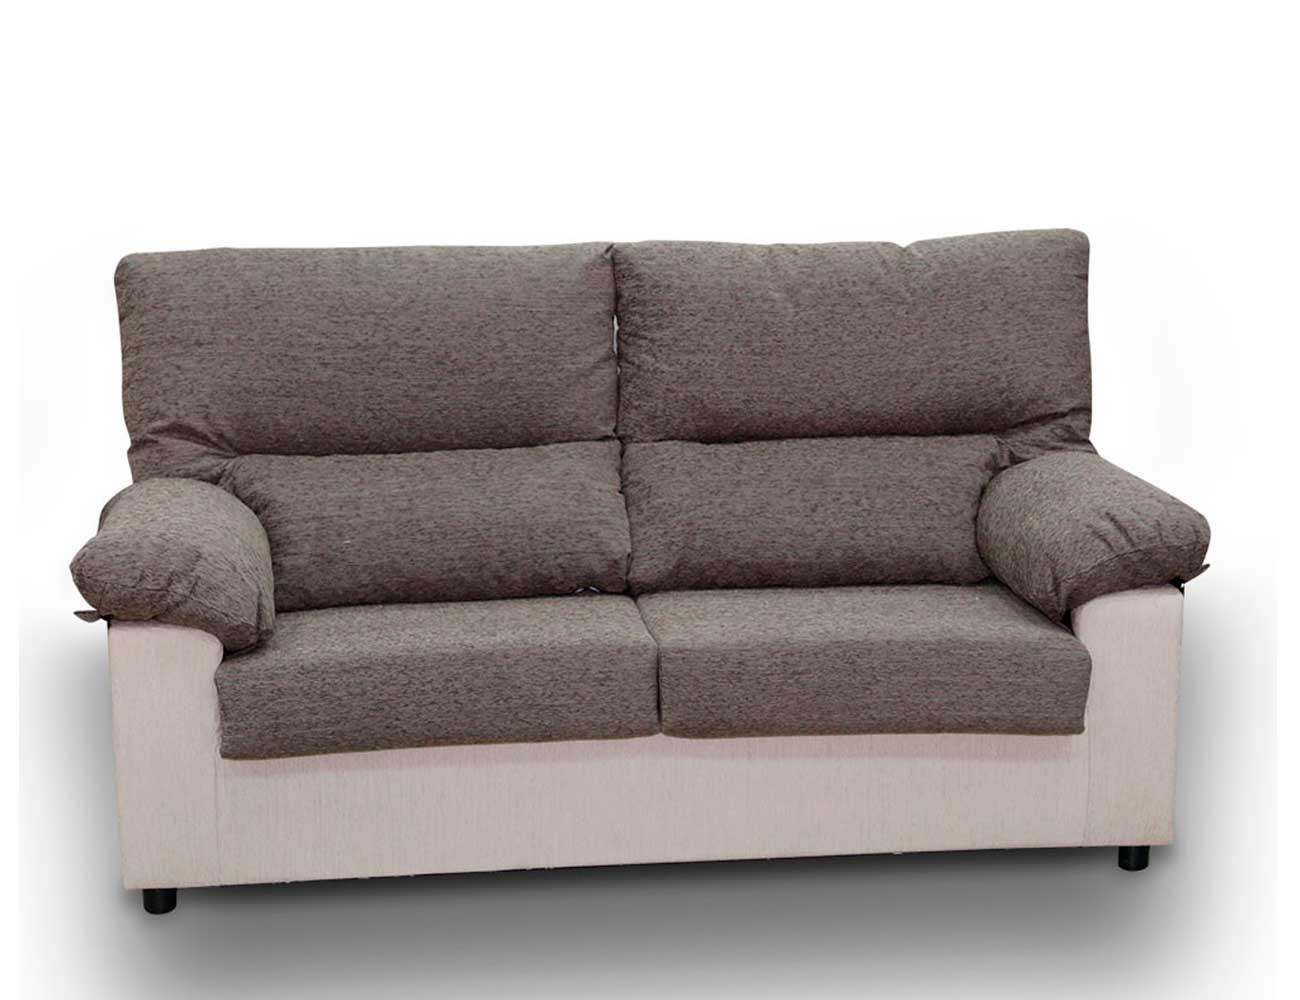 Sofa 3 plazas barato28